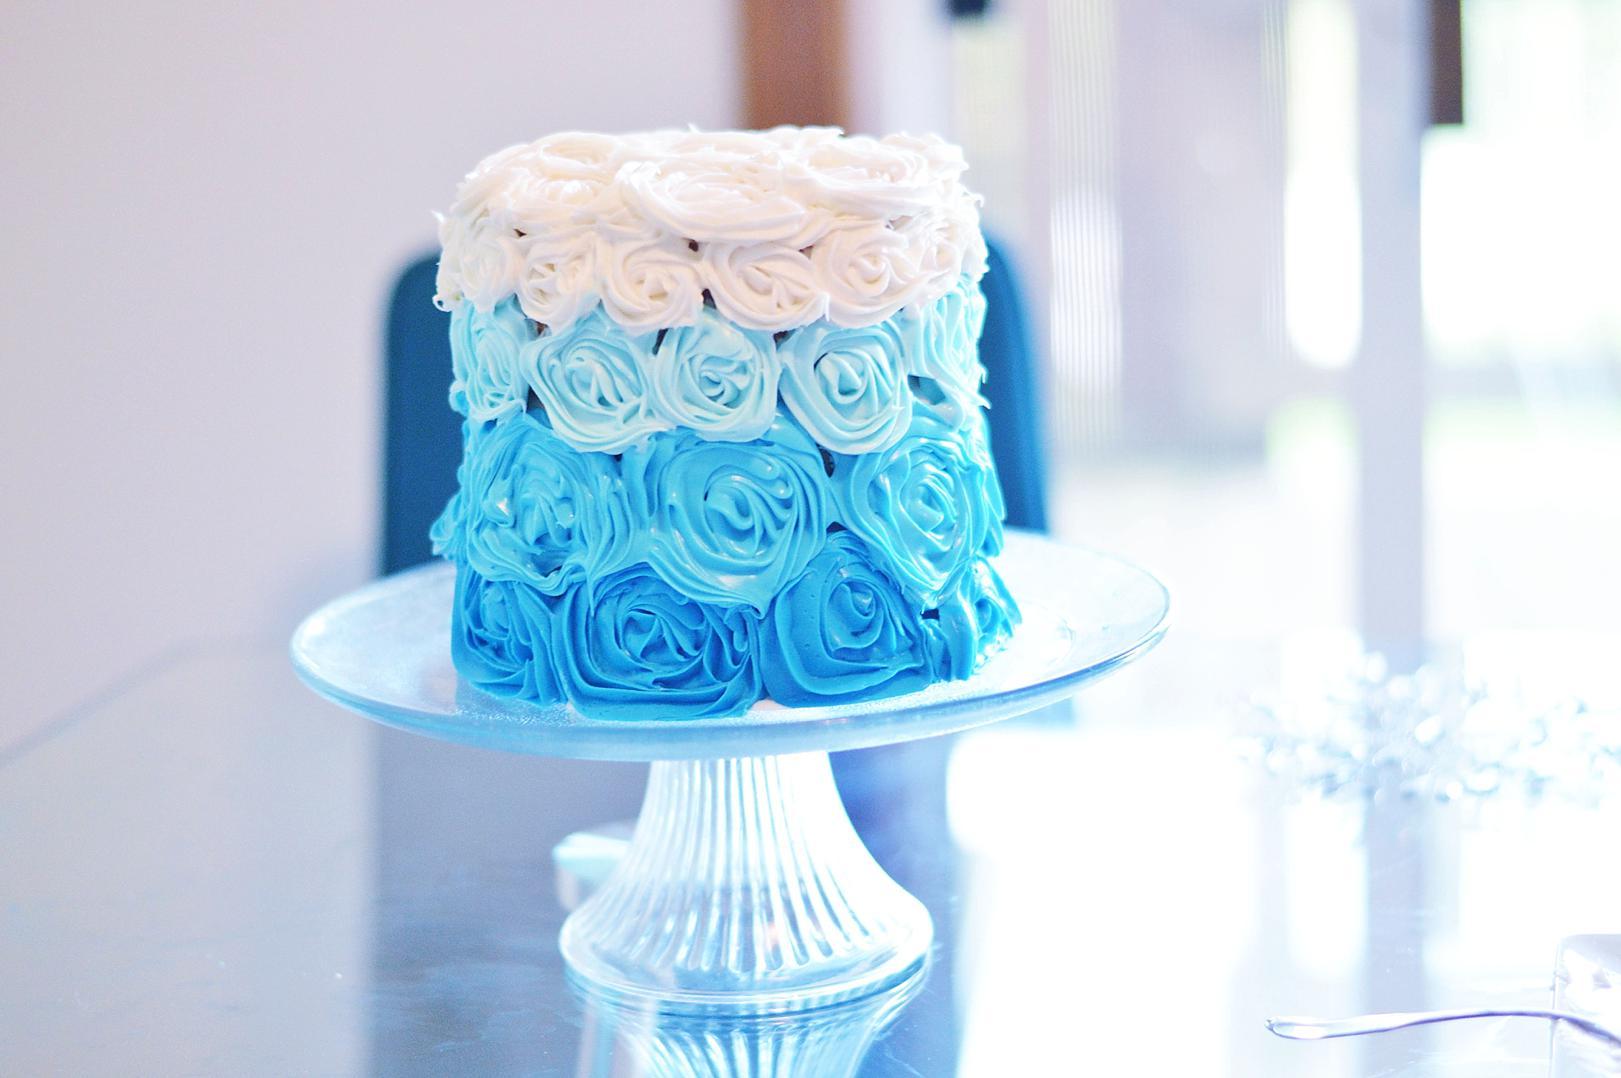 DIY Frozen Party Easy Beautiful Frozen Cake Frozen Party